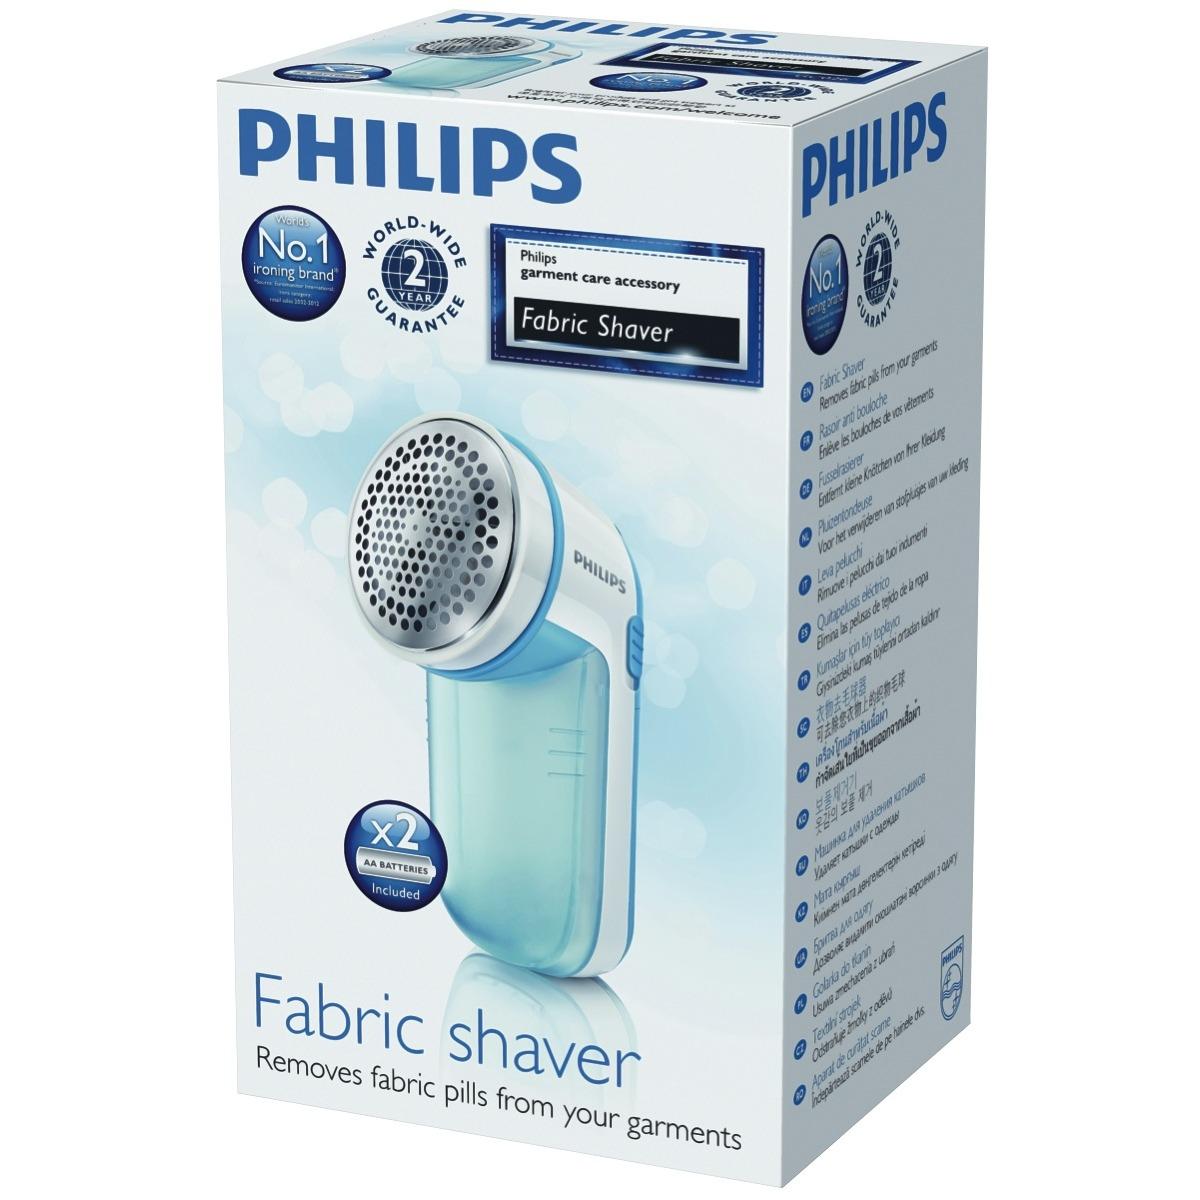 2.Philips GC026-00